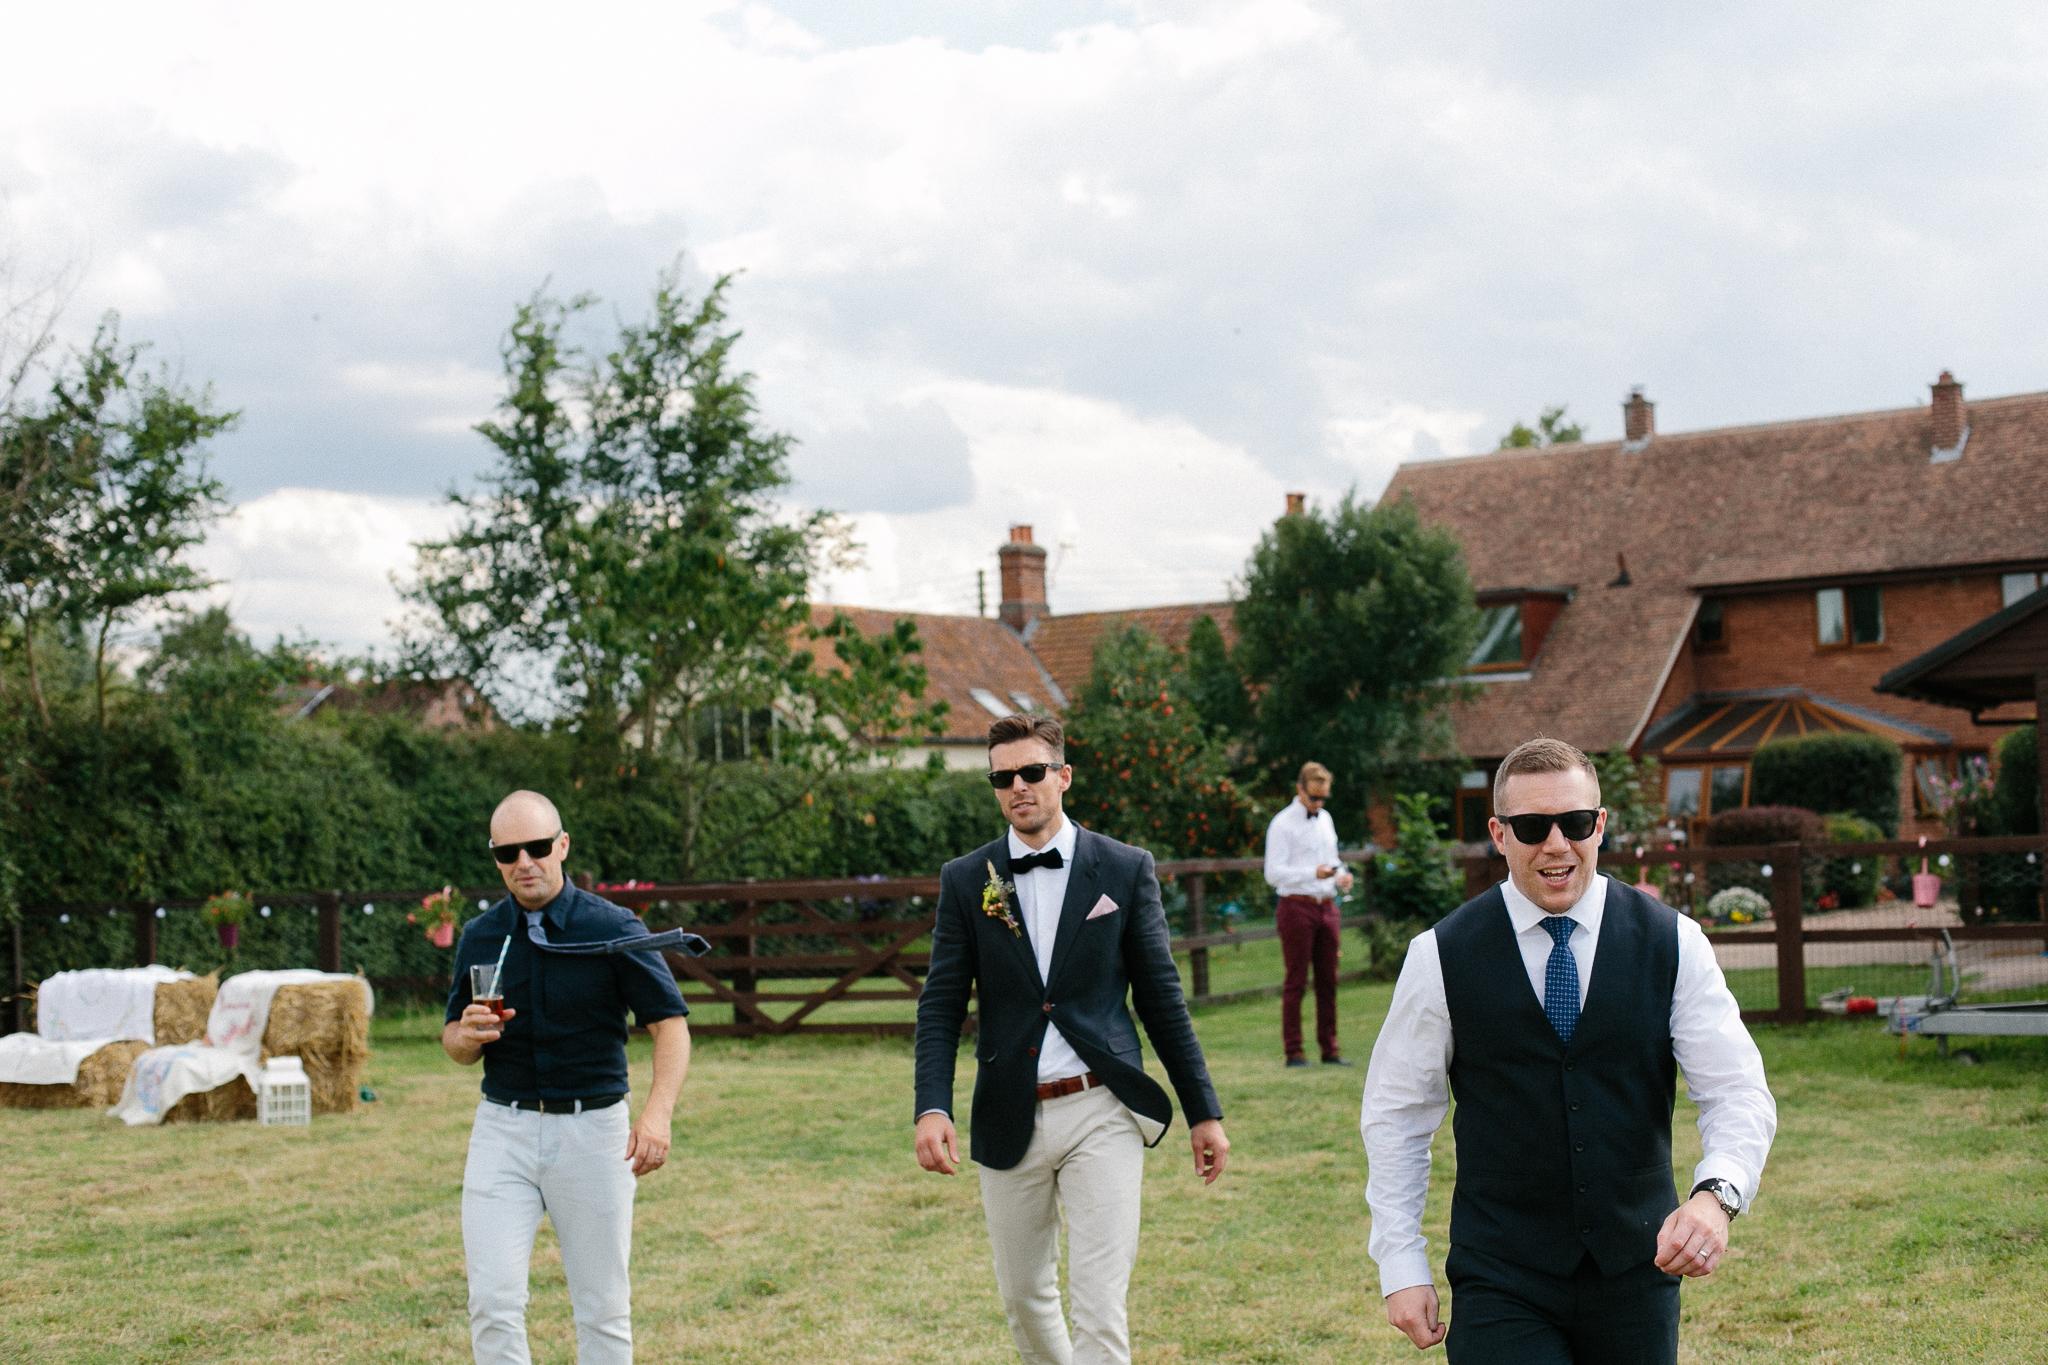 grantham_wedding_photographer-87.jpg